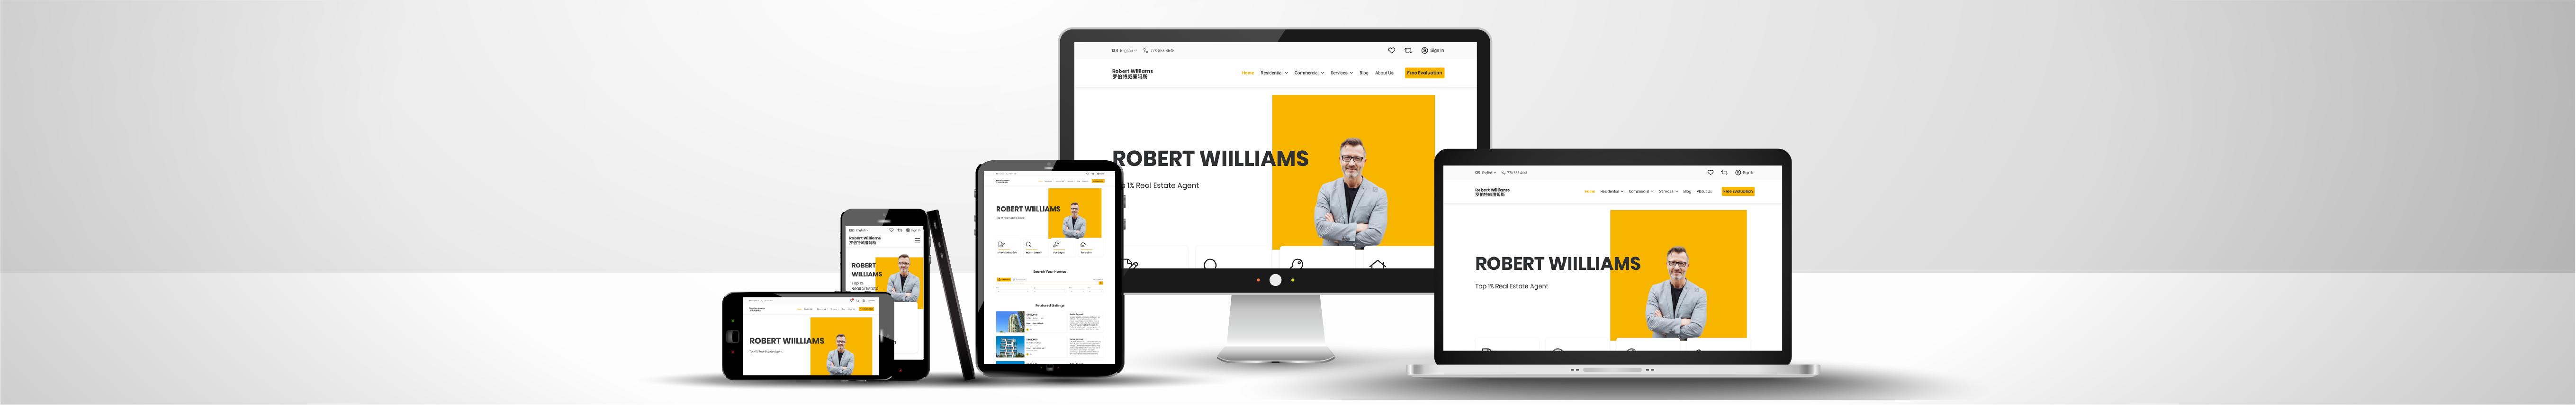 Web Design & Development Solutions for REALTORS®/Real Estate Agents